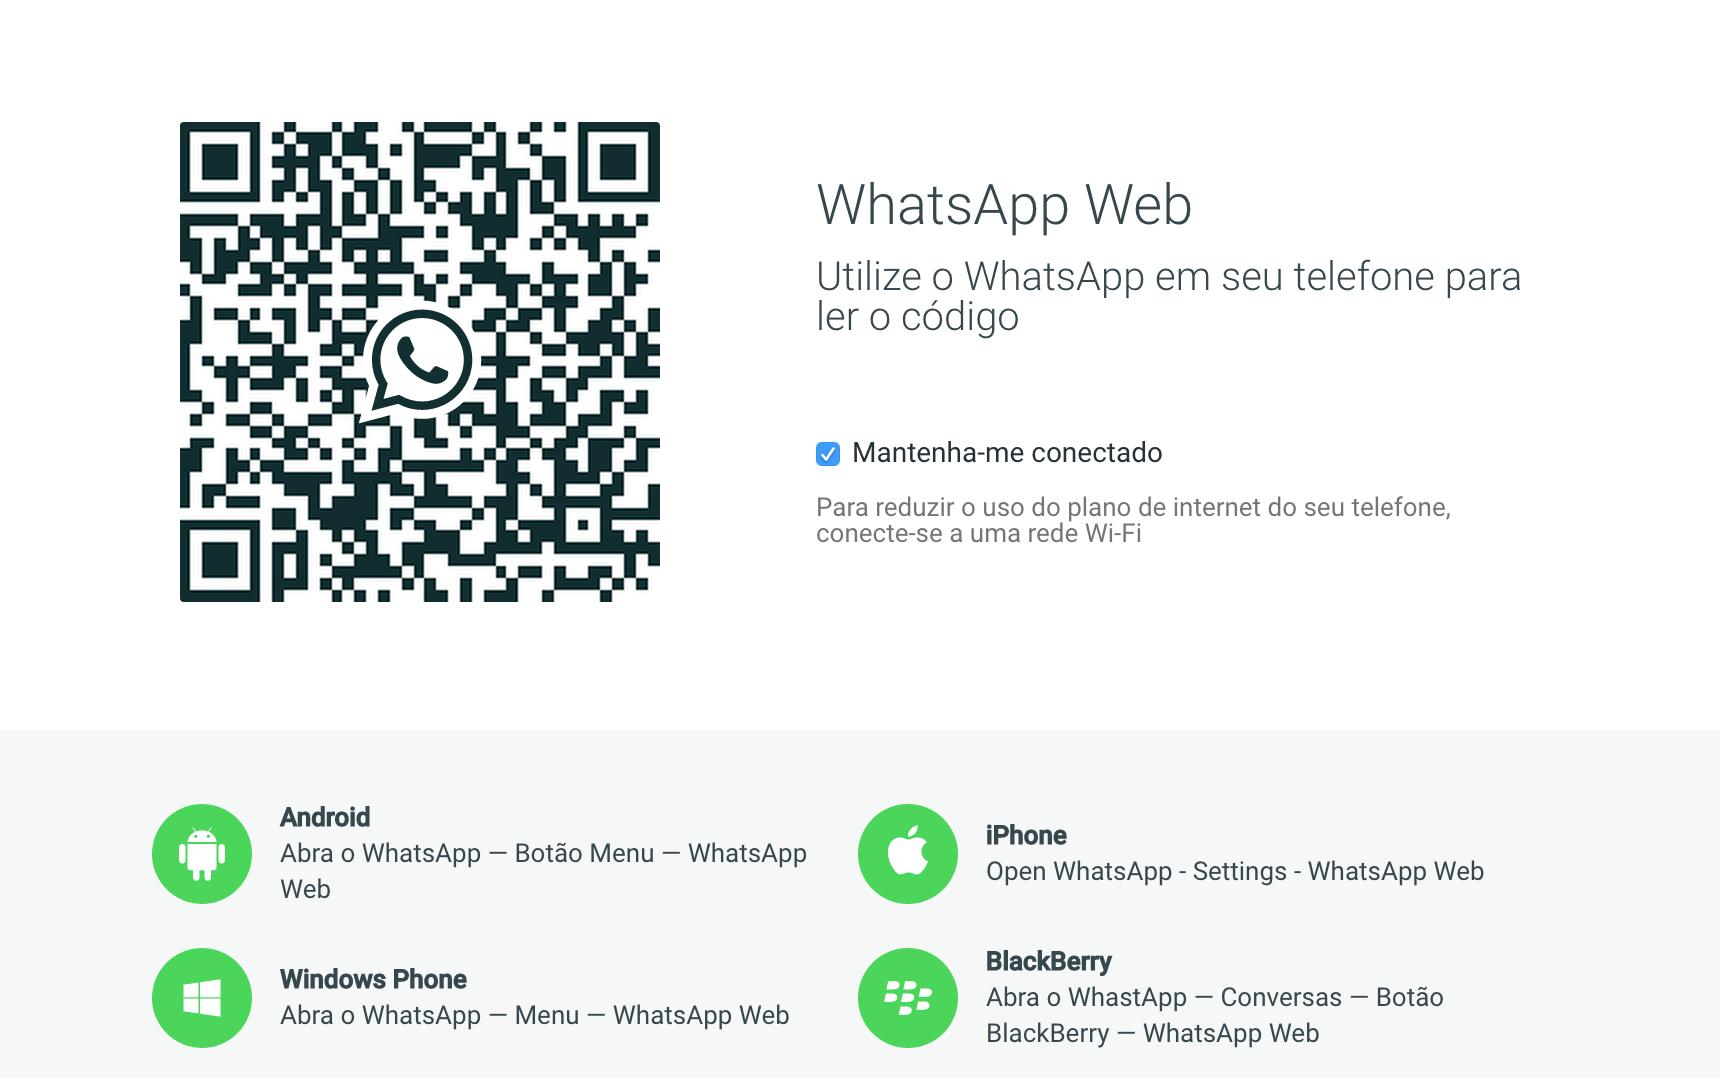 WhatsApp Web: como escanear o código QR no celular – Aplicativos